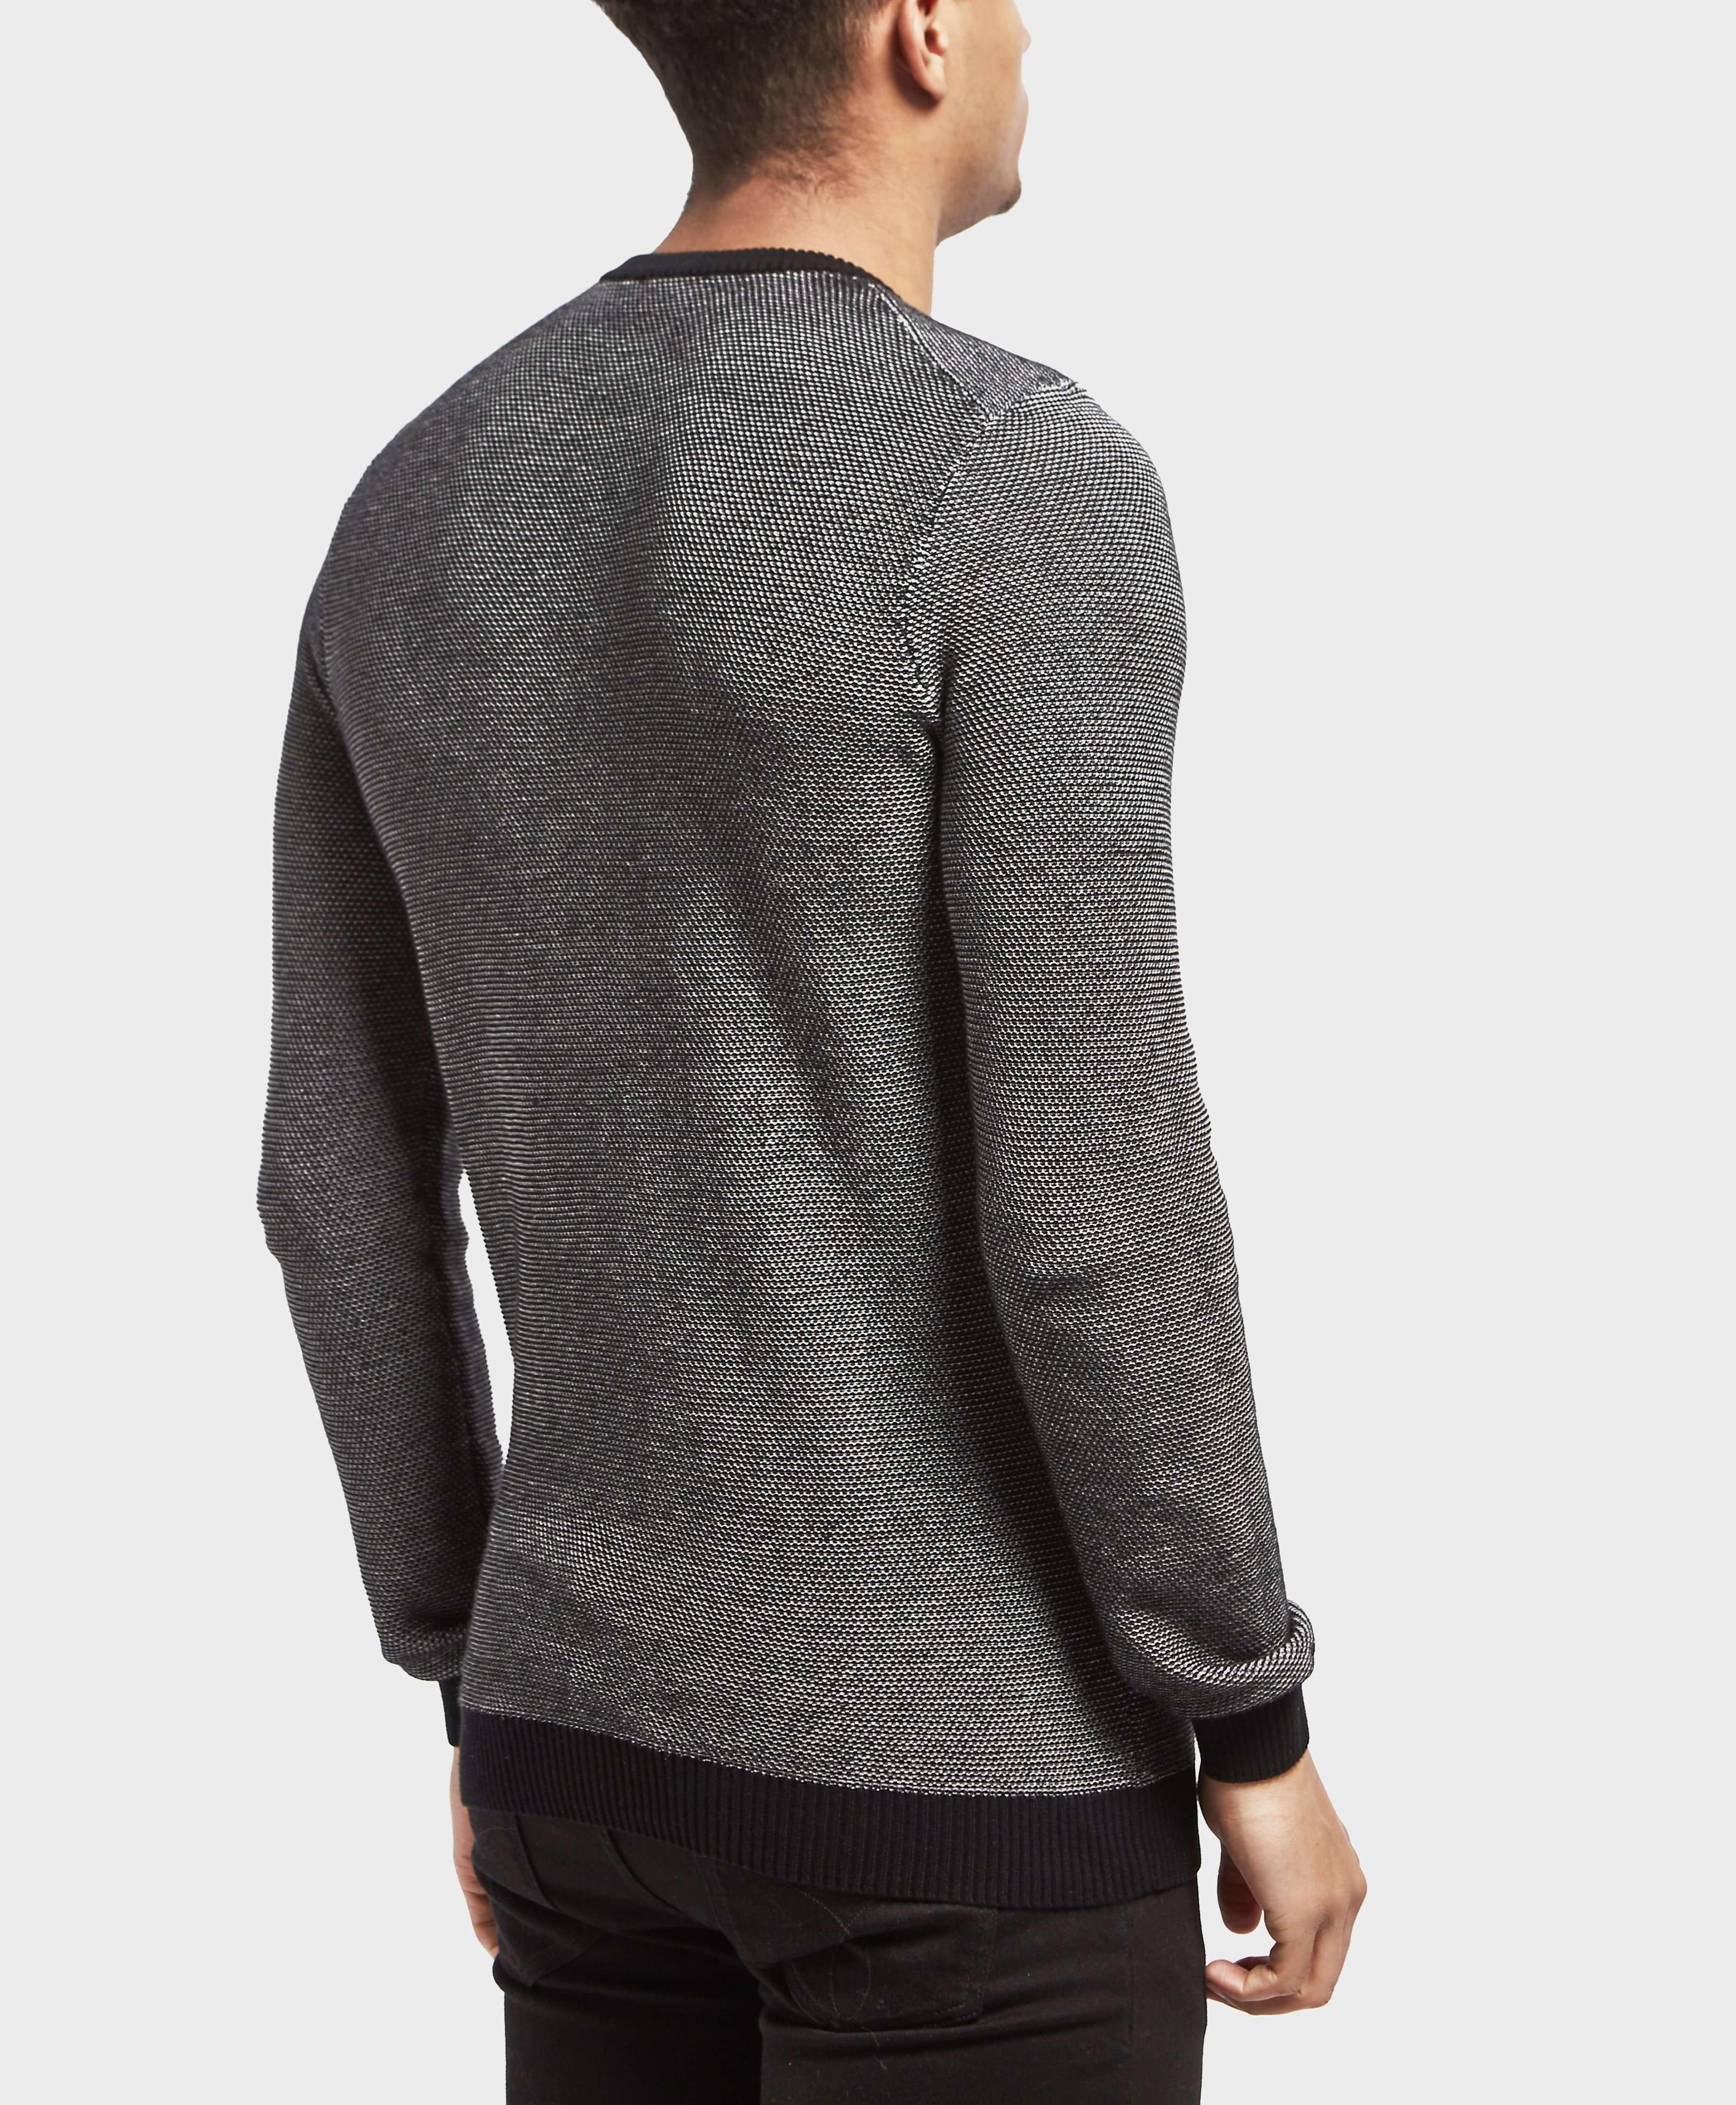 adidas Originals Camo Firebird Track Top | scotts Menswear